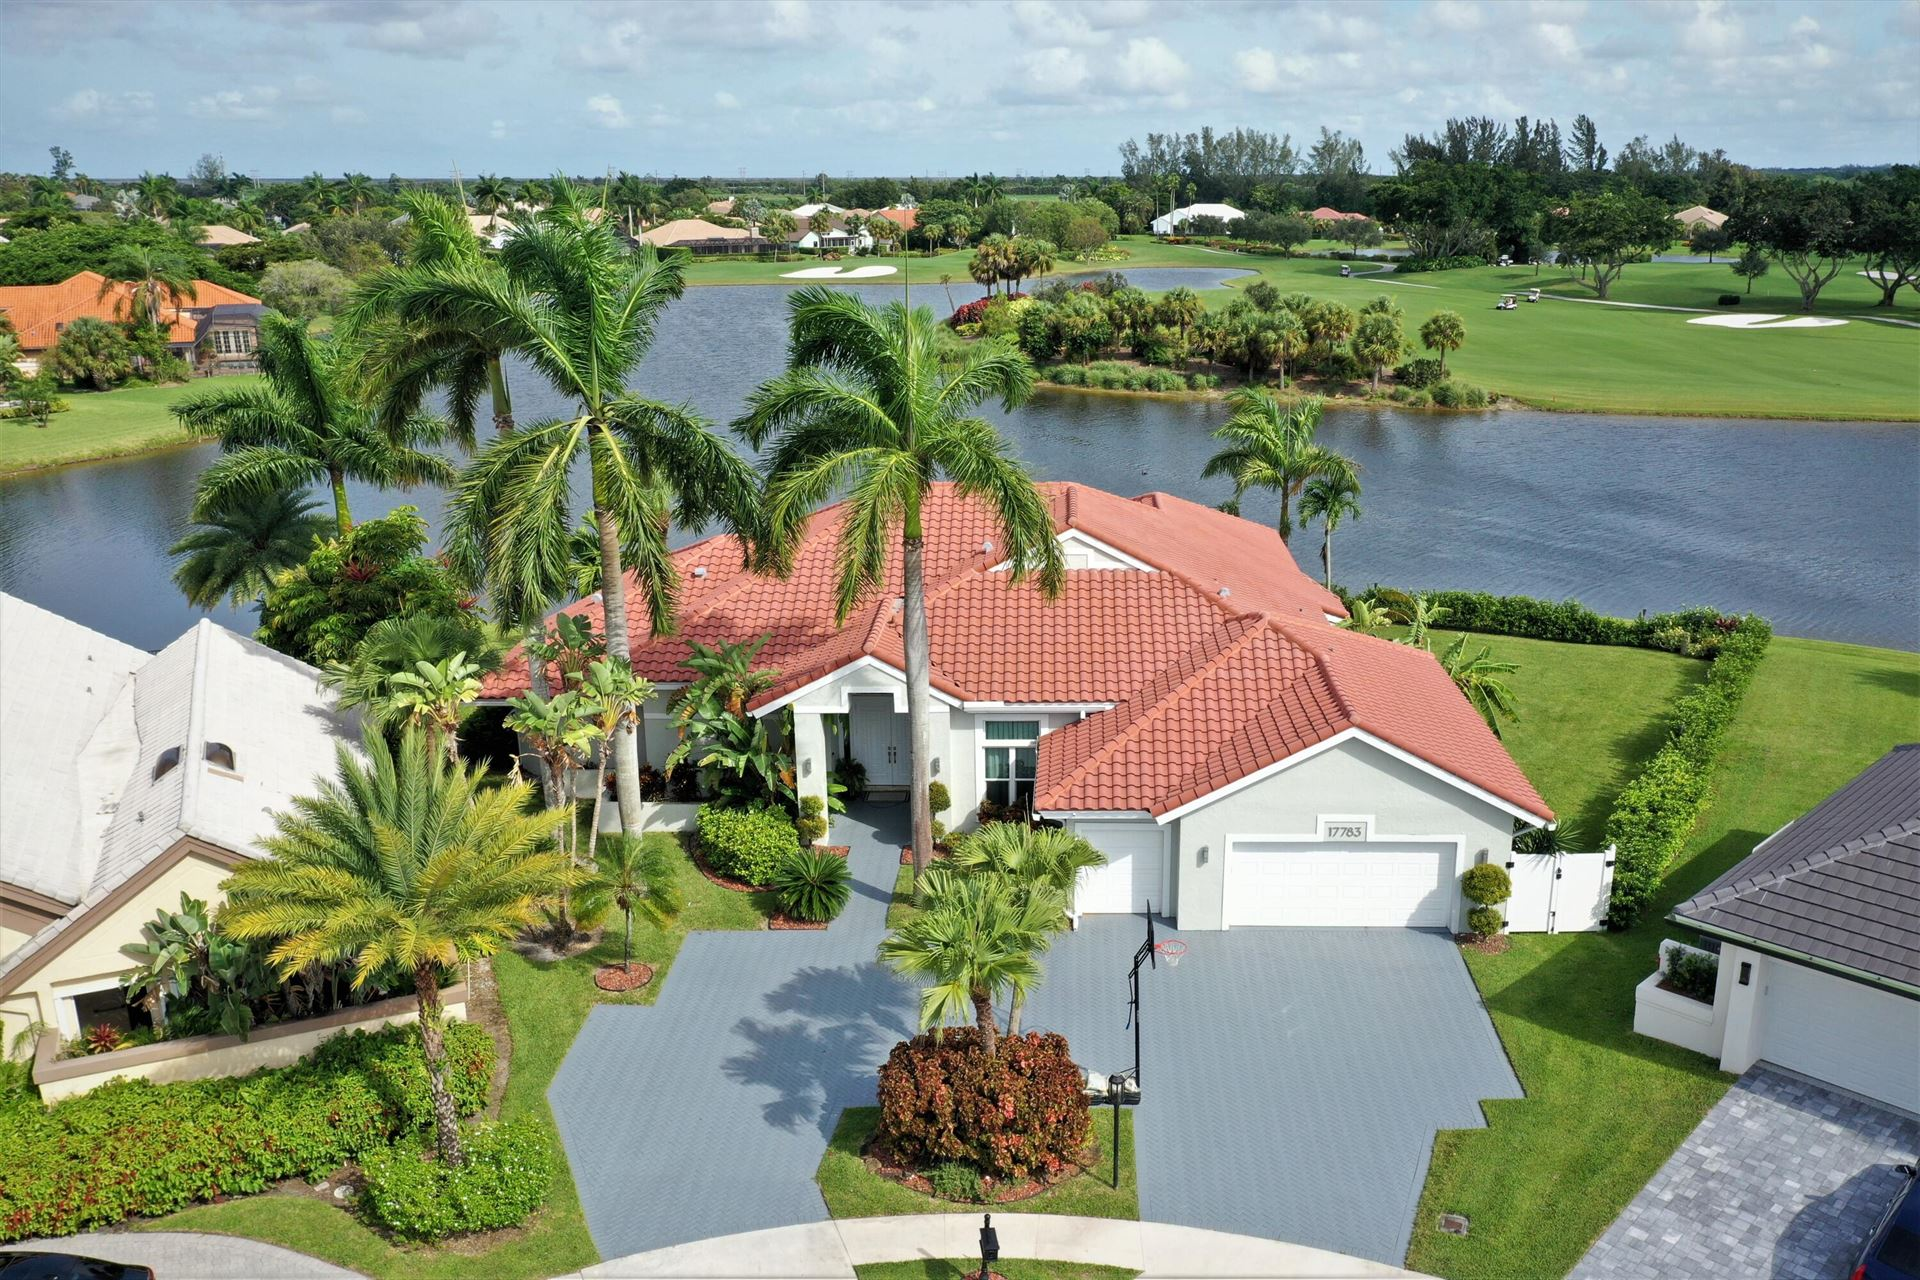 17783 Heather Ridge Lane, Boca Raton, FL 33498 - MLS#: RX-10745713